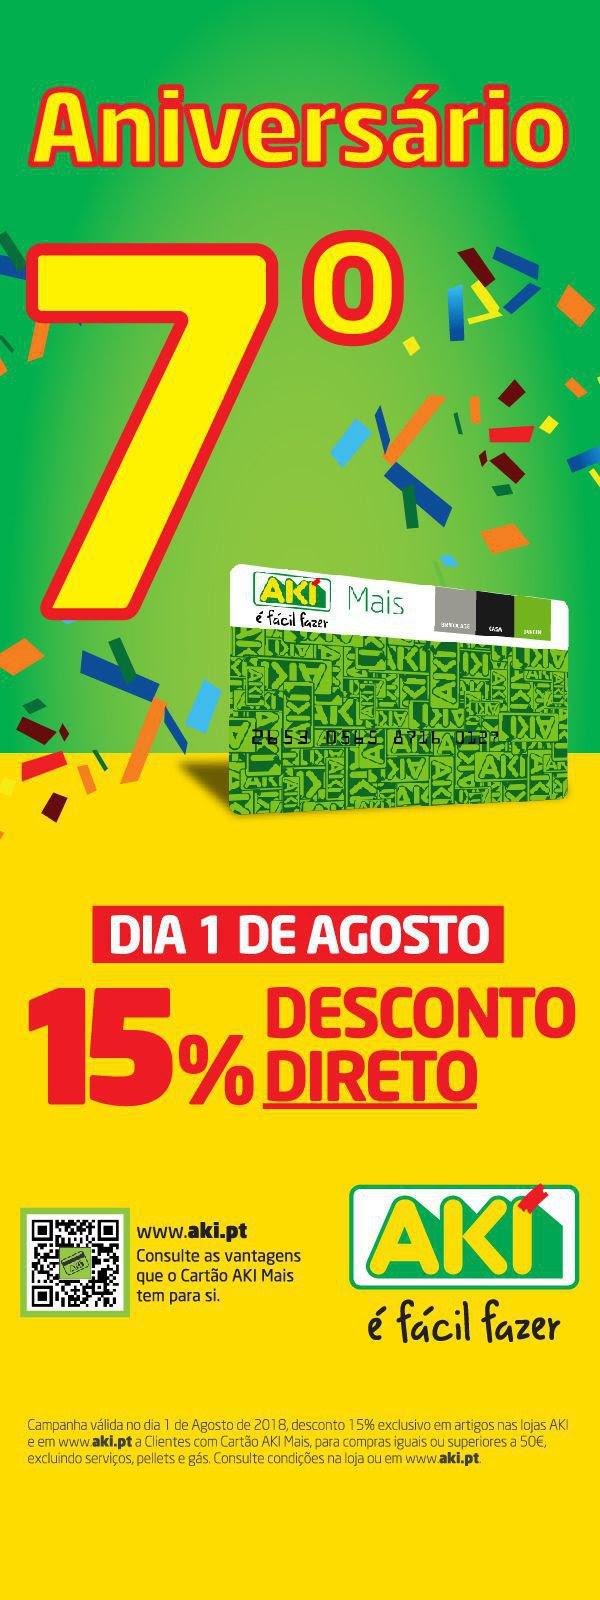 15% desconto direto no AKI » 1 de agosto na sua loja AKI!